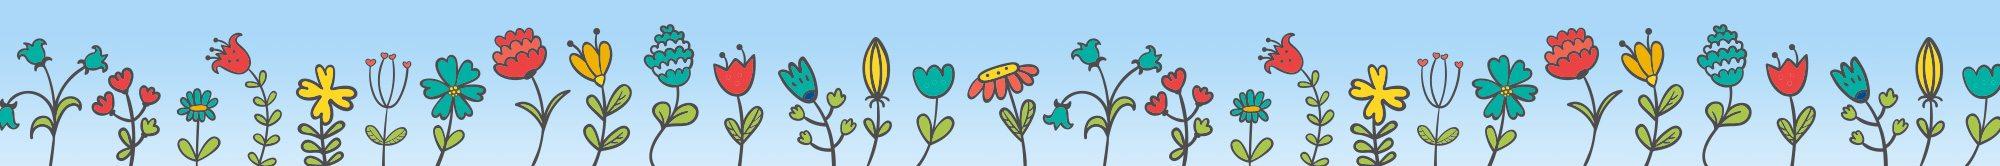 Flower Header Image